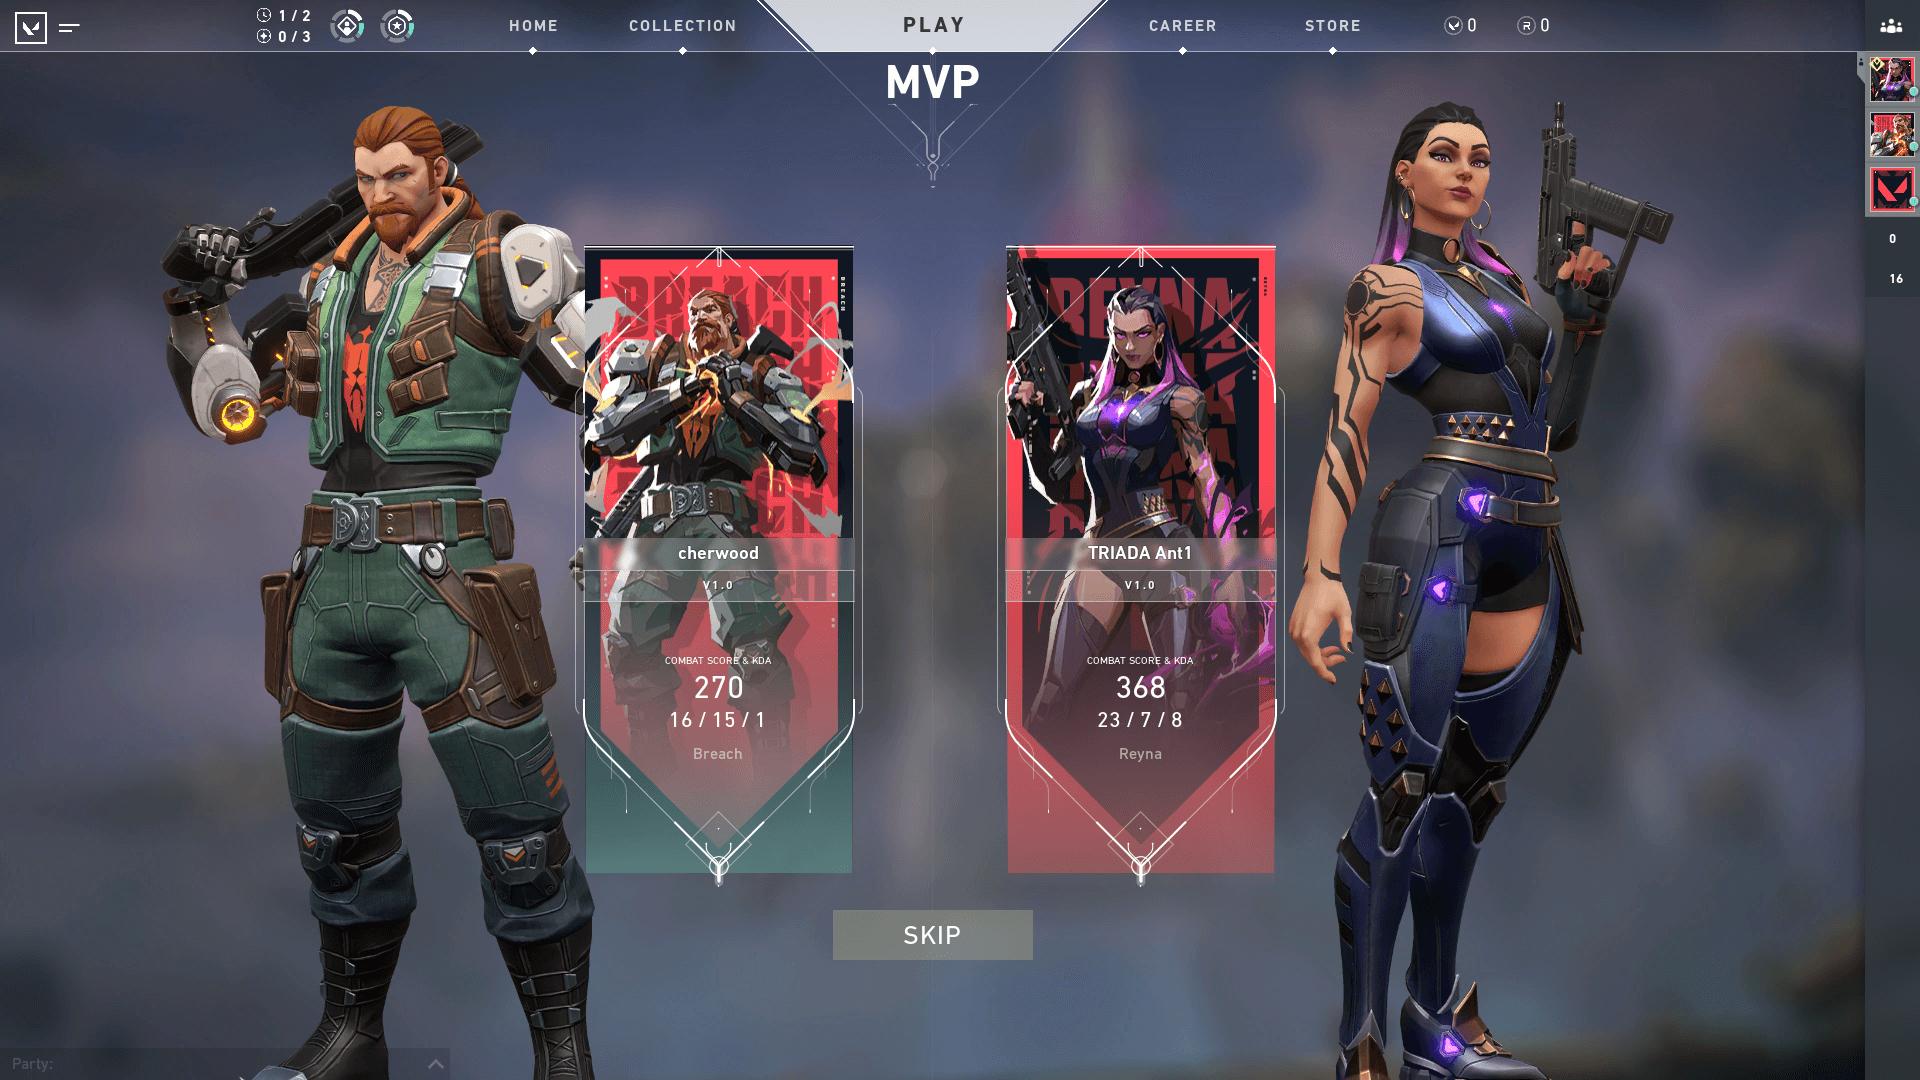 MVP screenshot of Valorant video game interface.